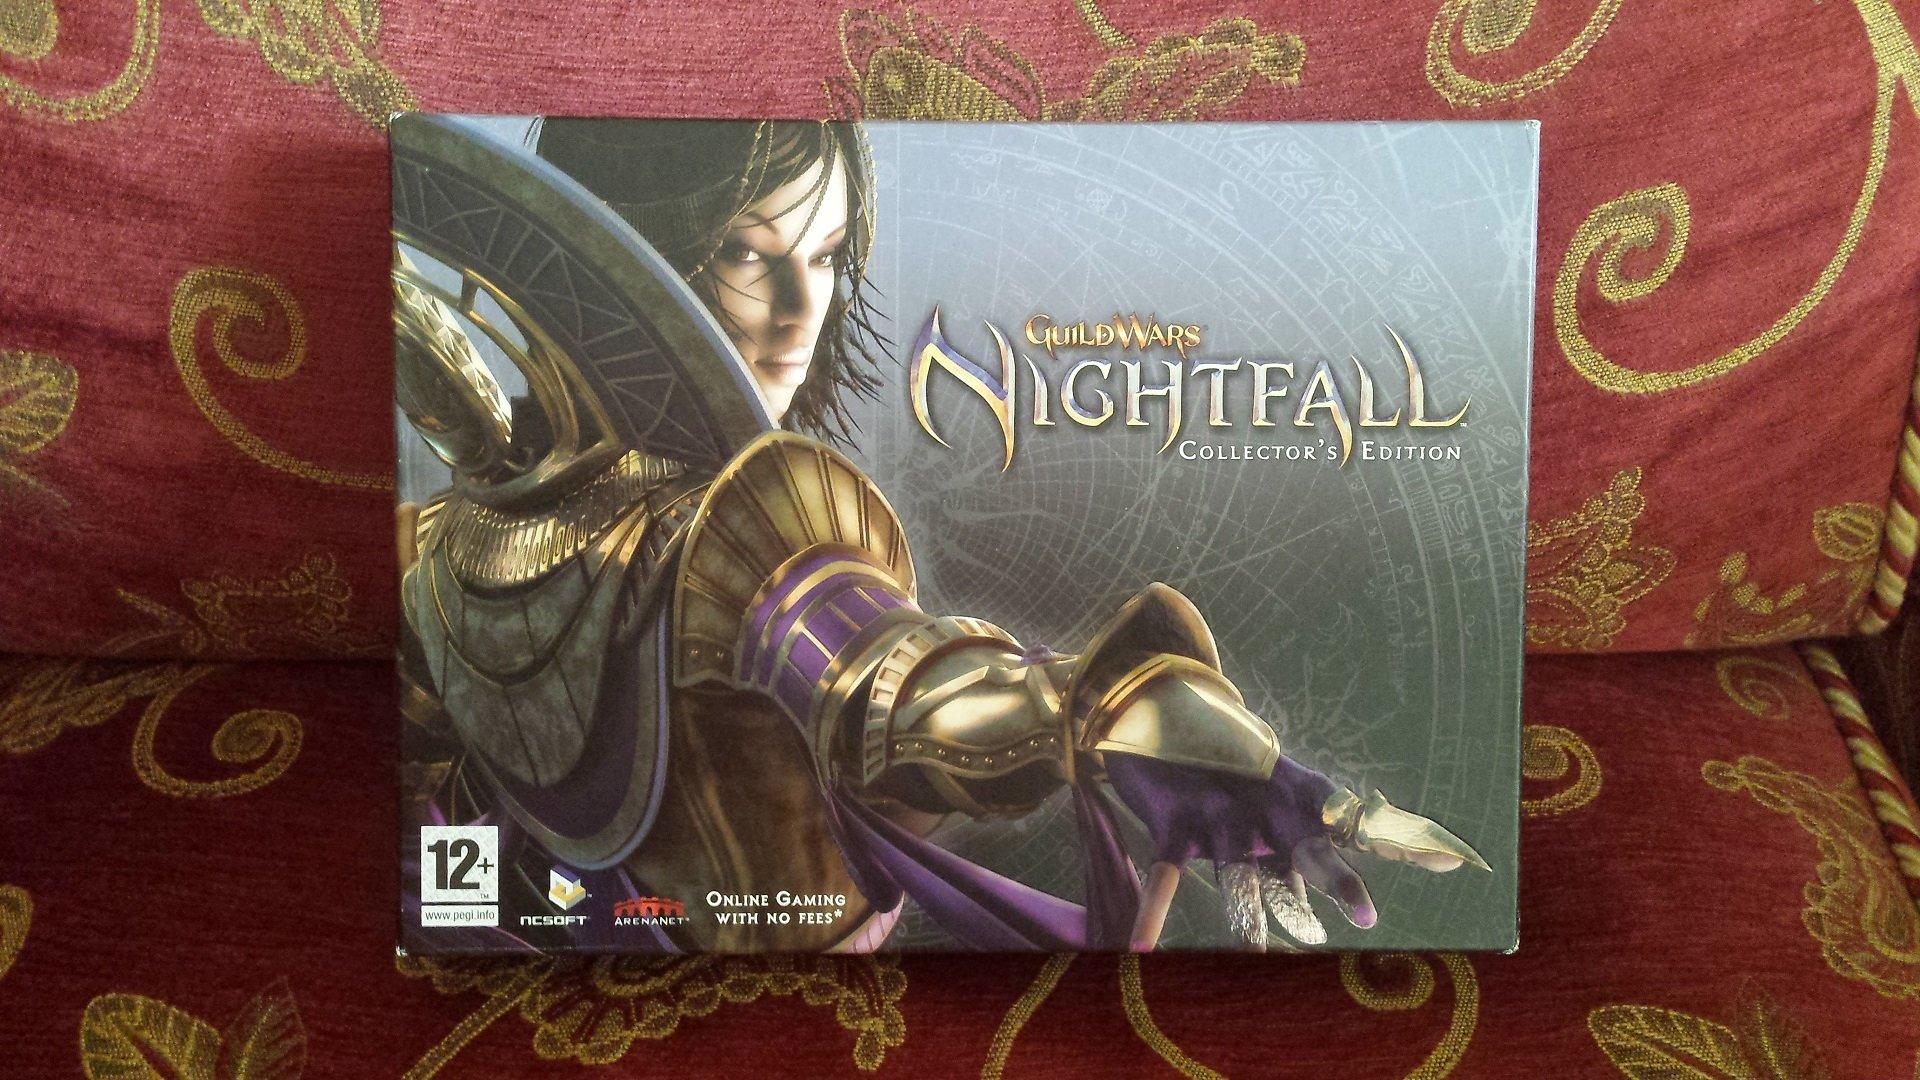 Guild Wars Nightfall.